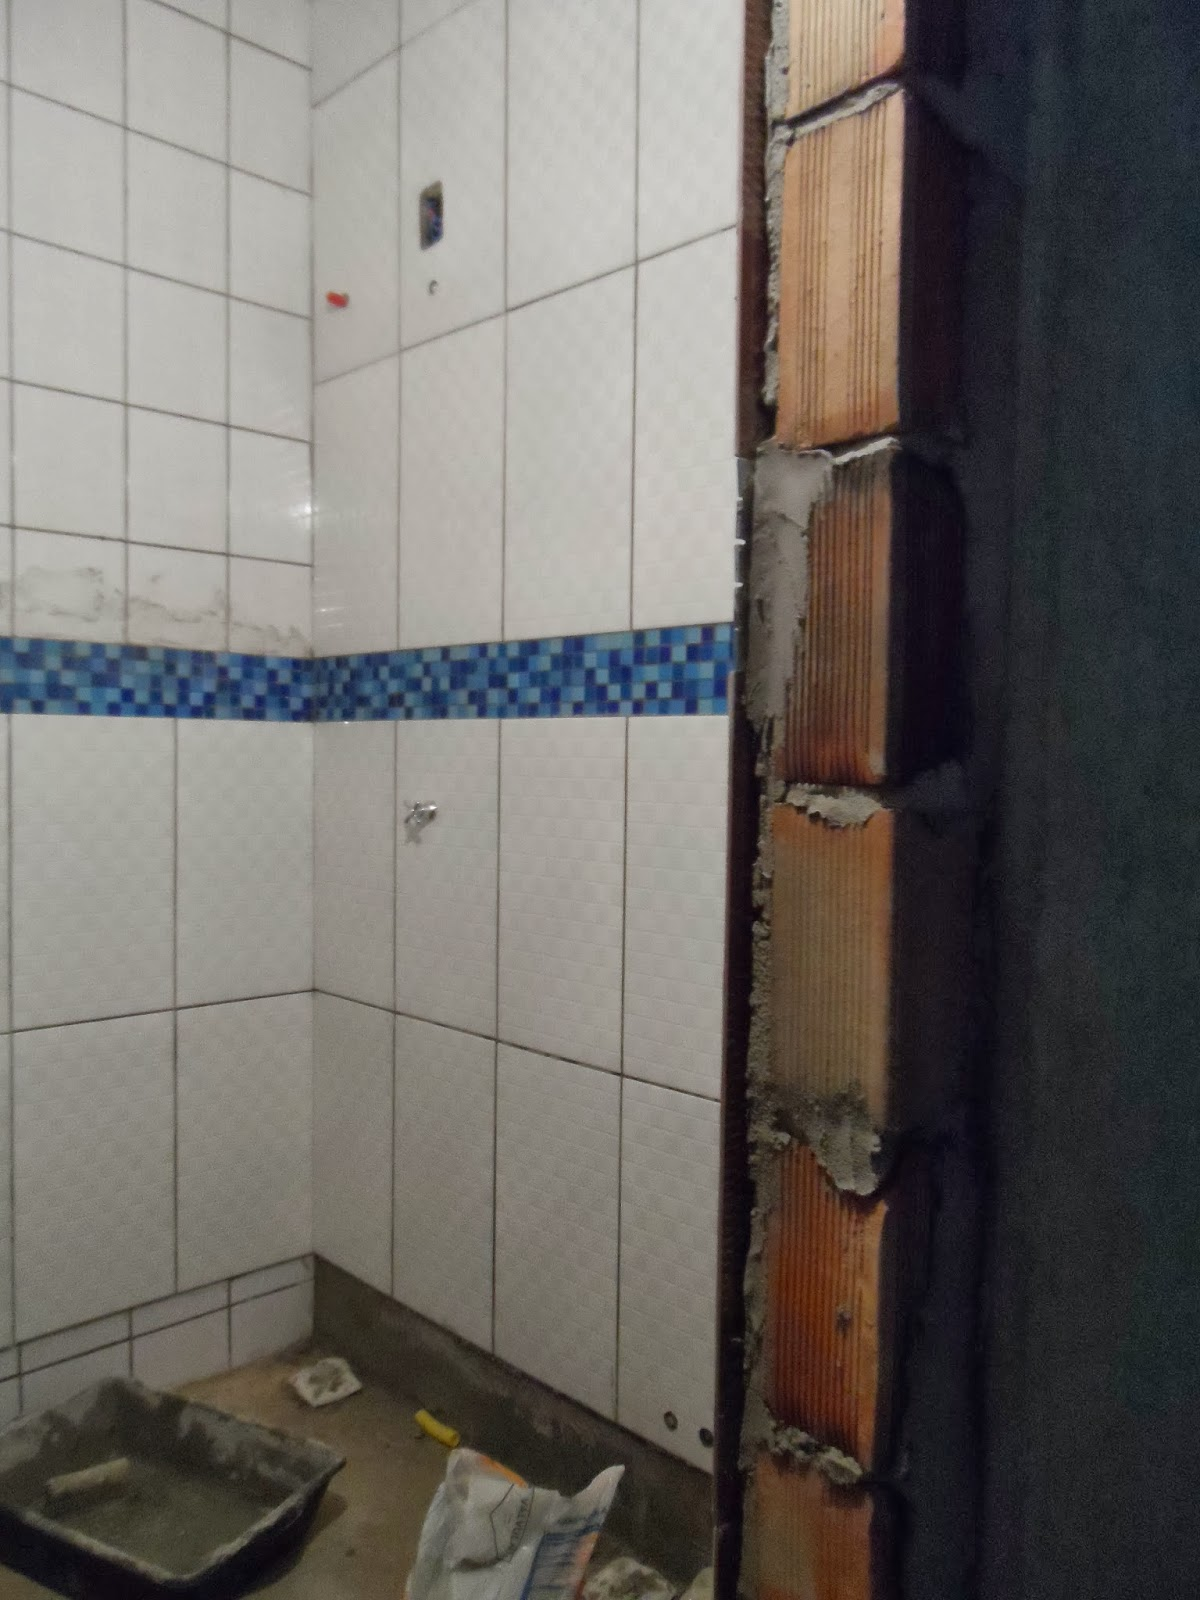 Minha casa te inspira: Banheiro azul e Branco #2C4165 1200x1600 Banheiro Branco E Azul